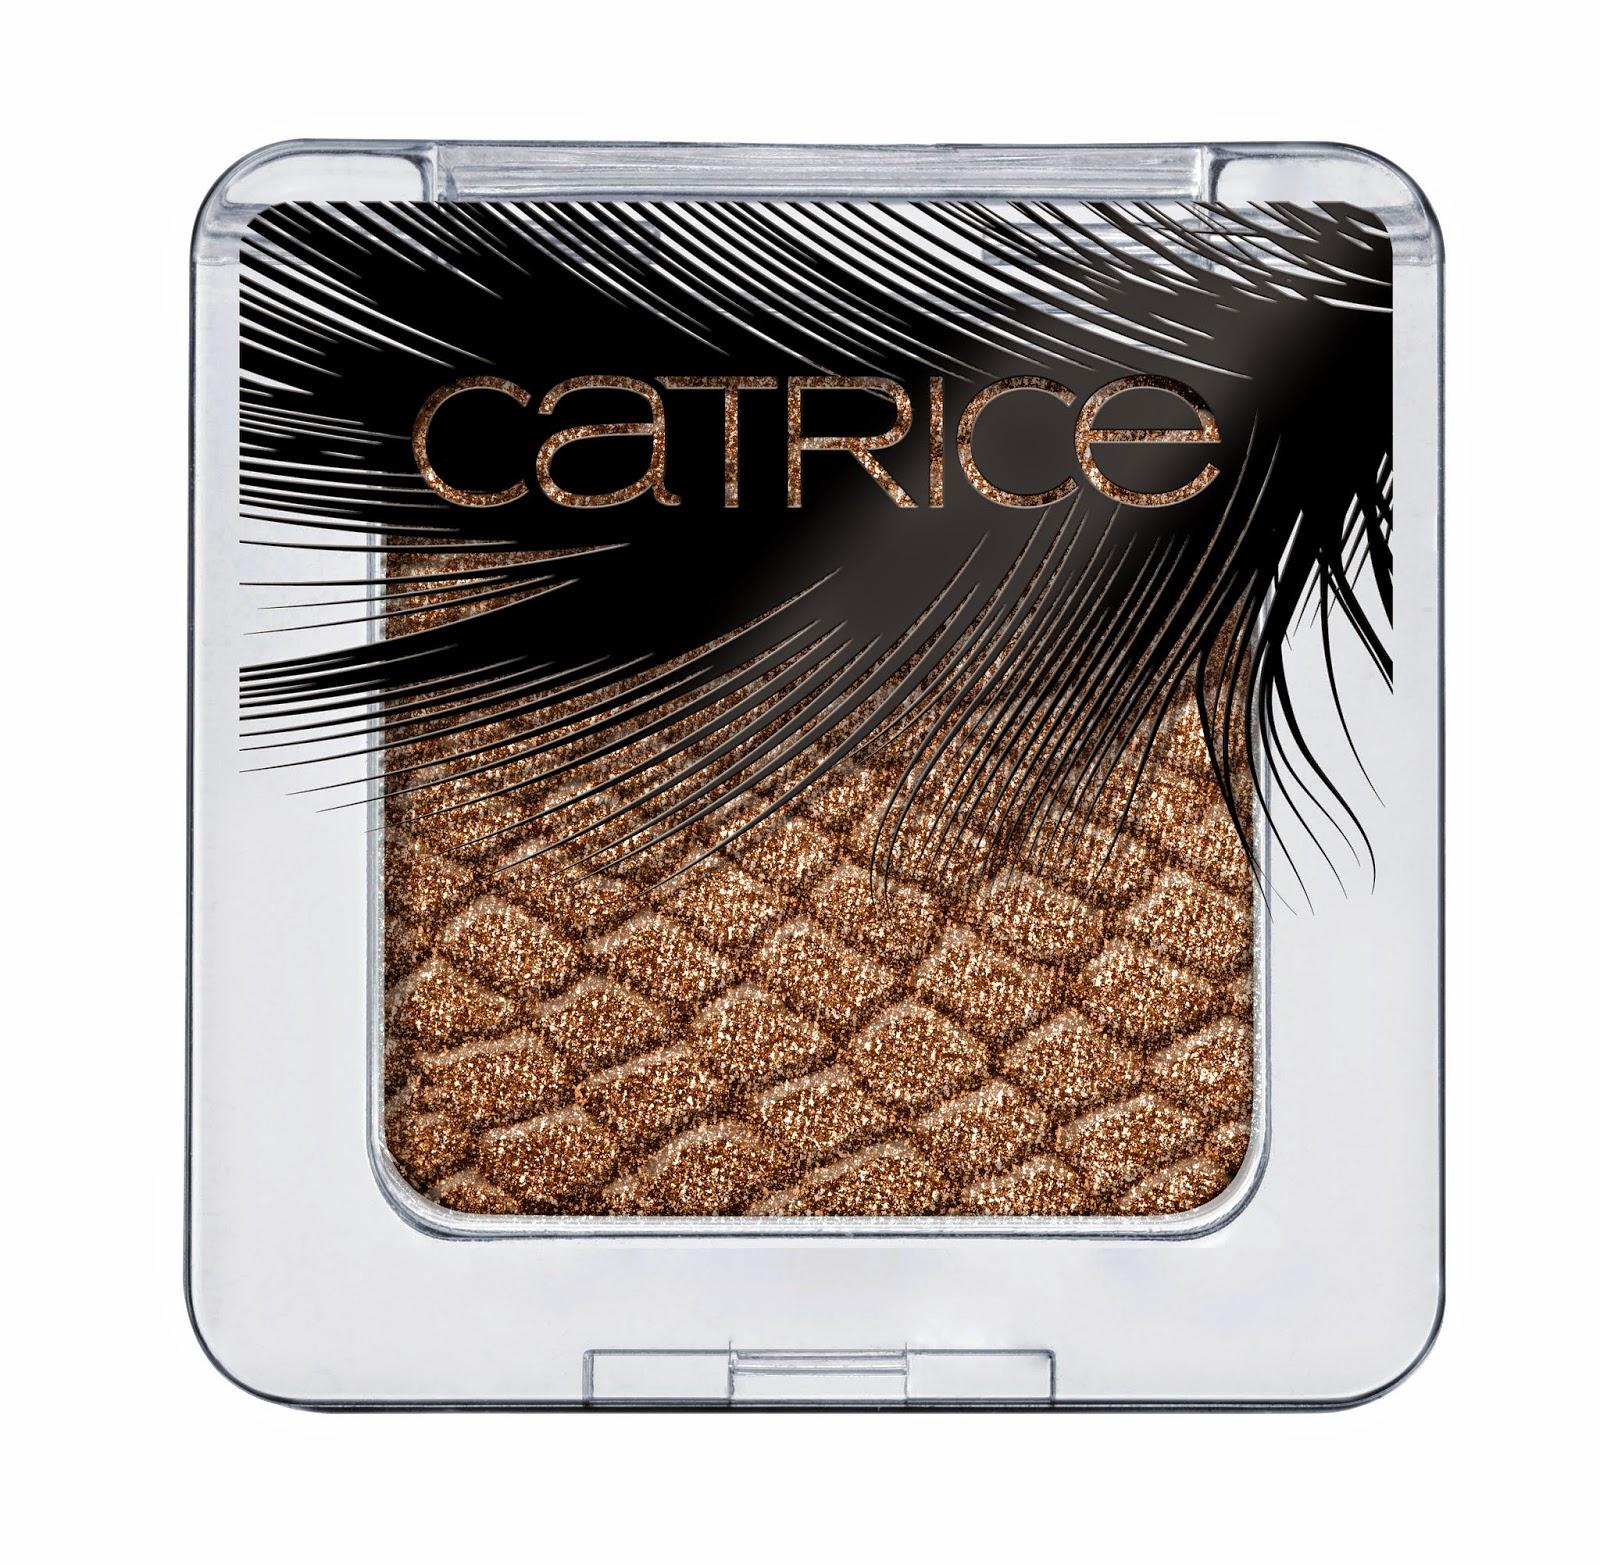 Catr_Feathered_Luxury_Eyeshadow_03